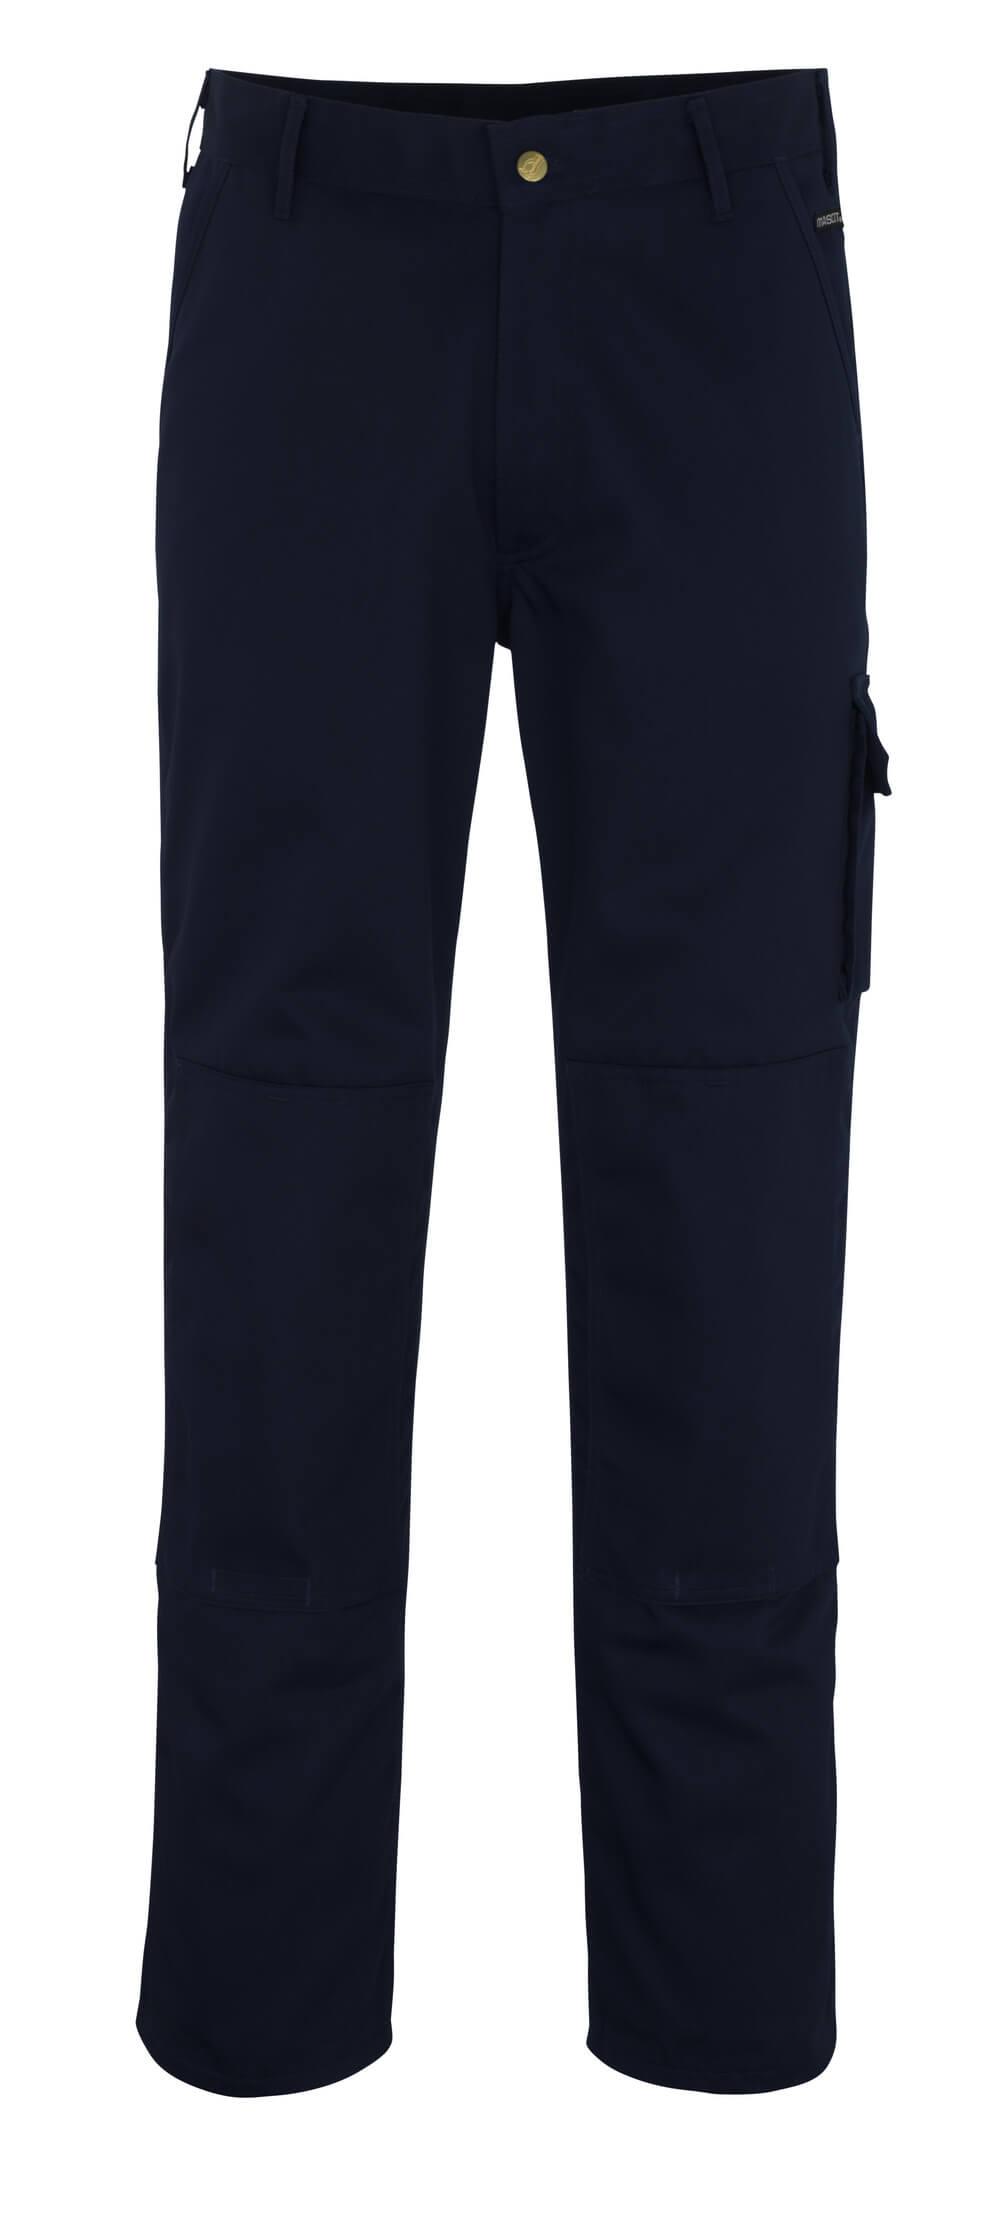 00279-430-01 Pantaloni con tasche porta-ginocchiere - blu navy